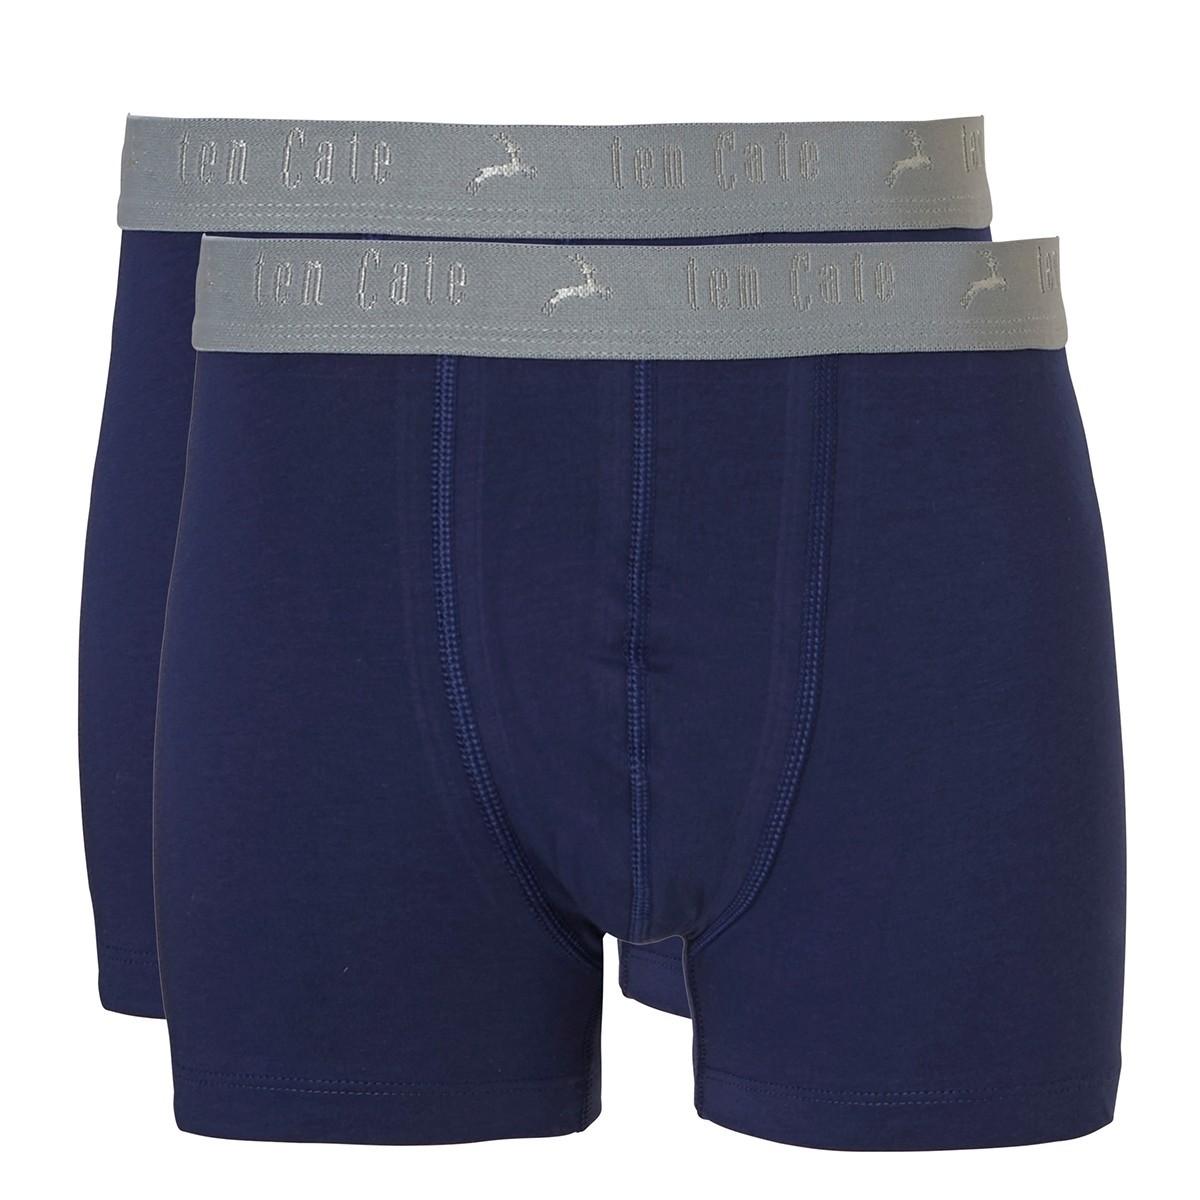 Ten Cate Teens Boys Basic Shorts 2-pack blue